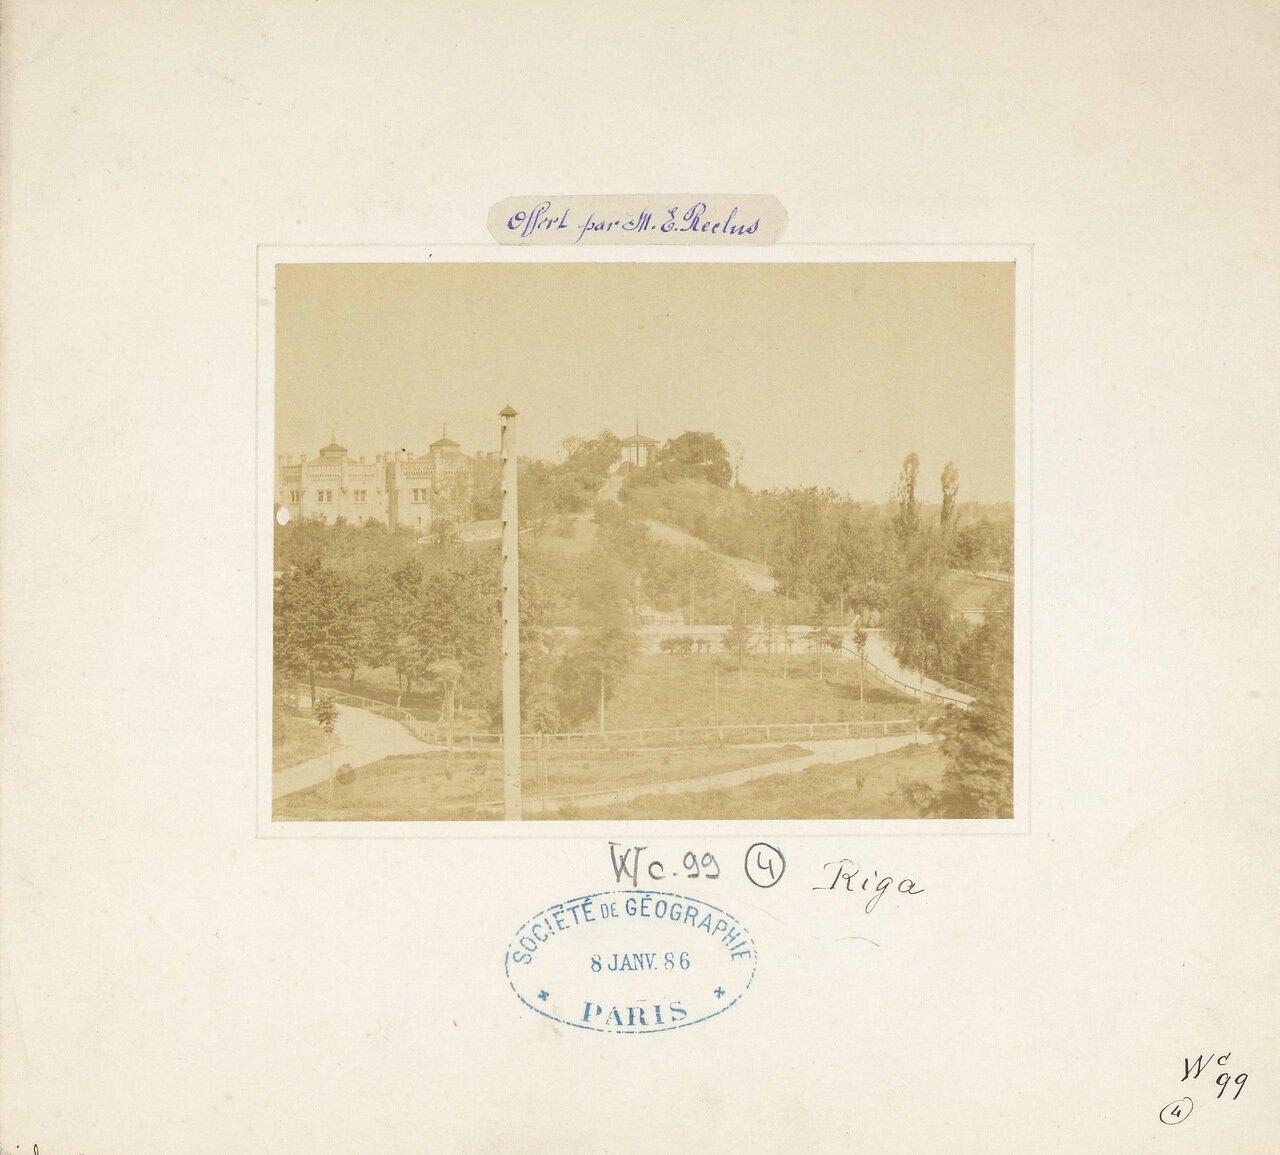 Без подписи. 1886